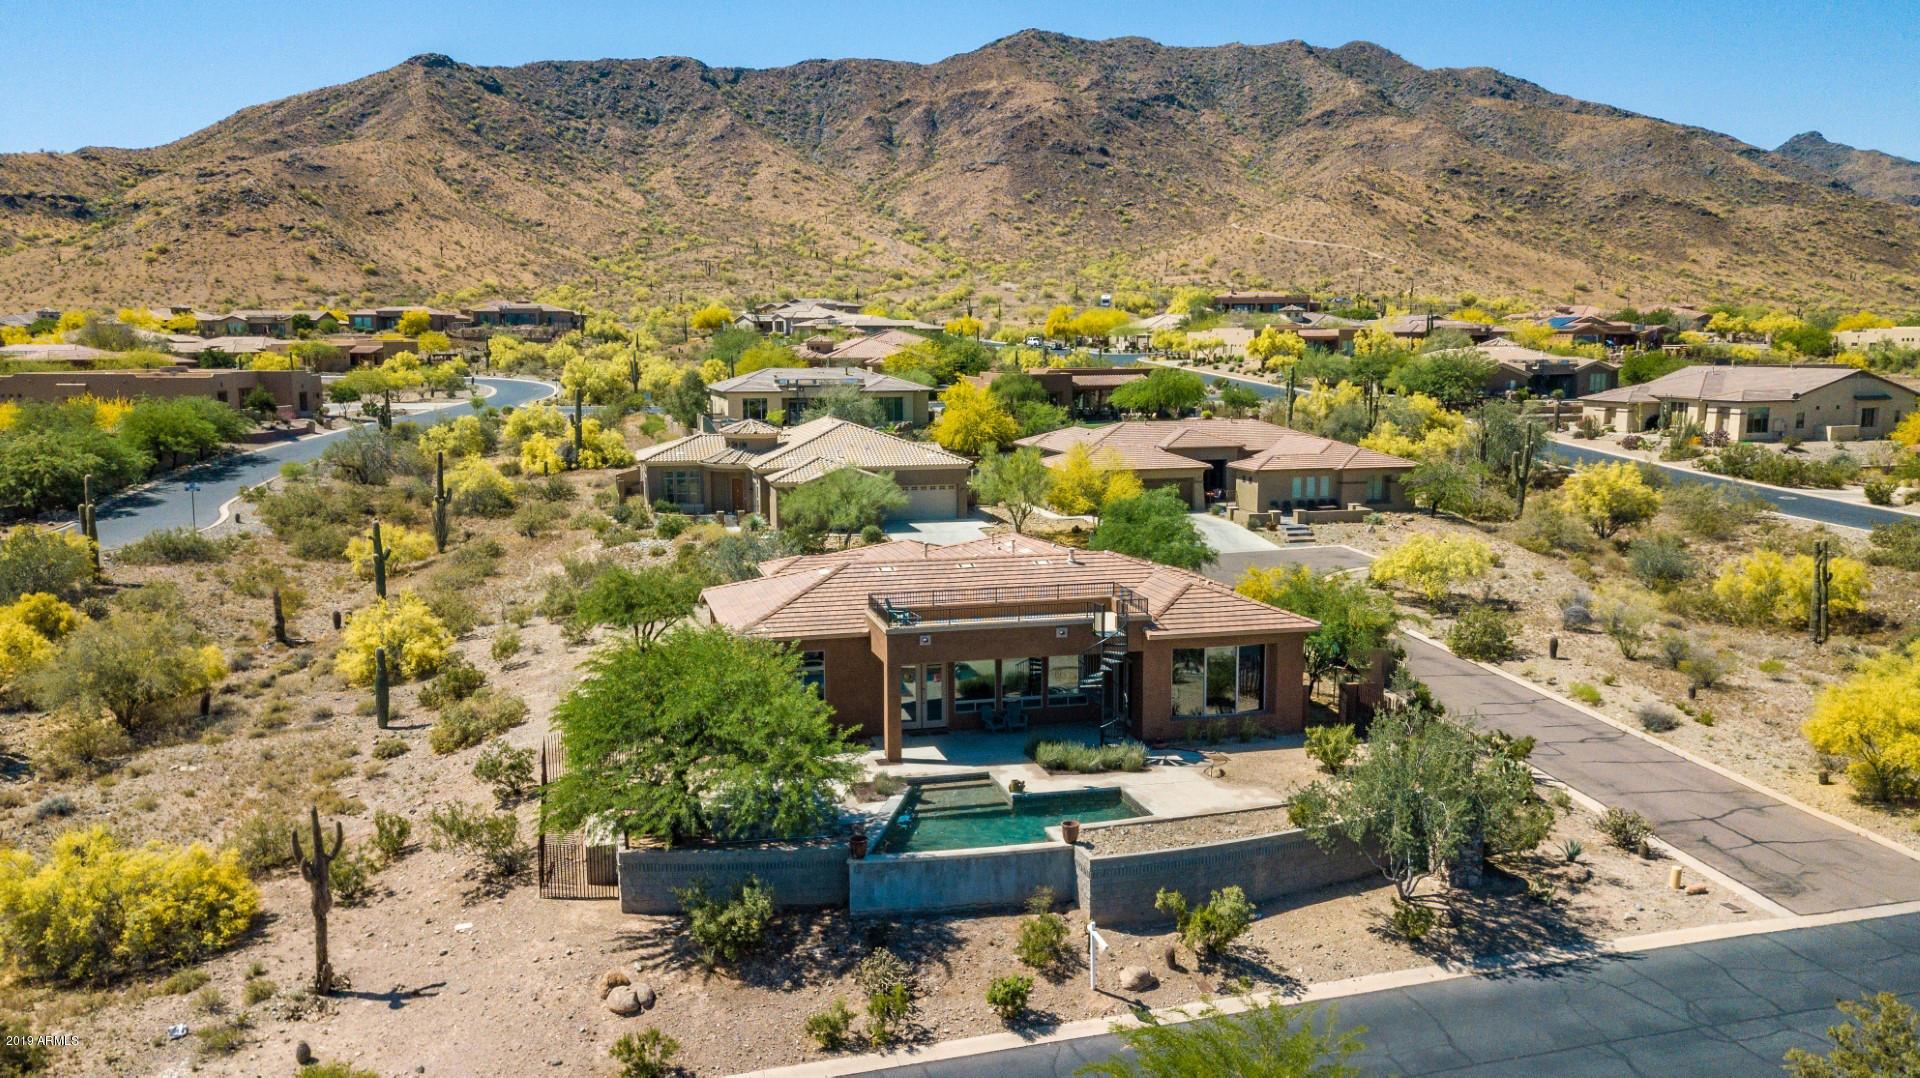 Photo of 1721 W PEARCE Road, Phoenix, AZ 85041